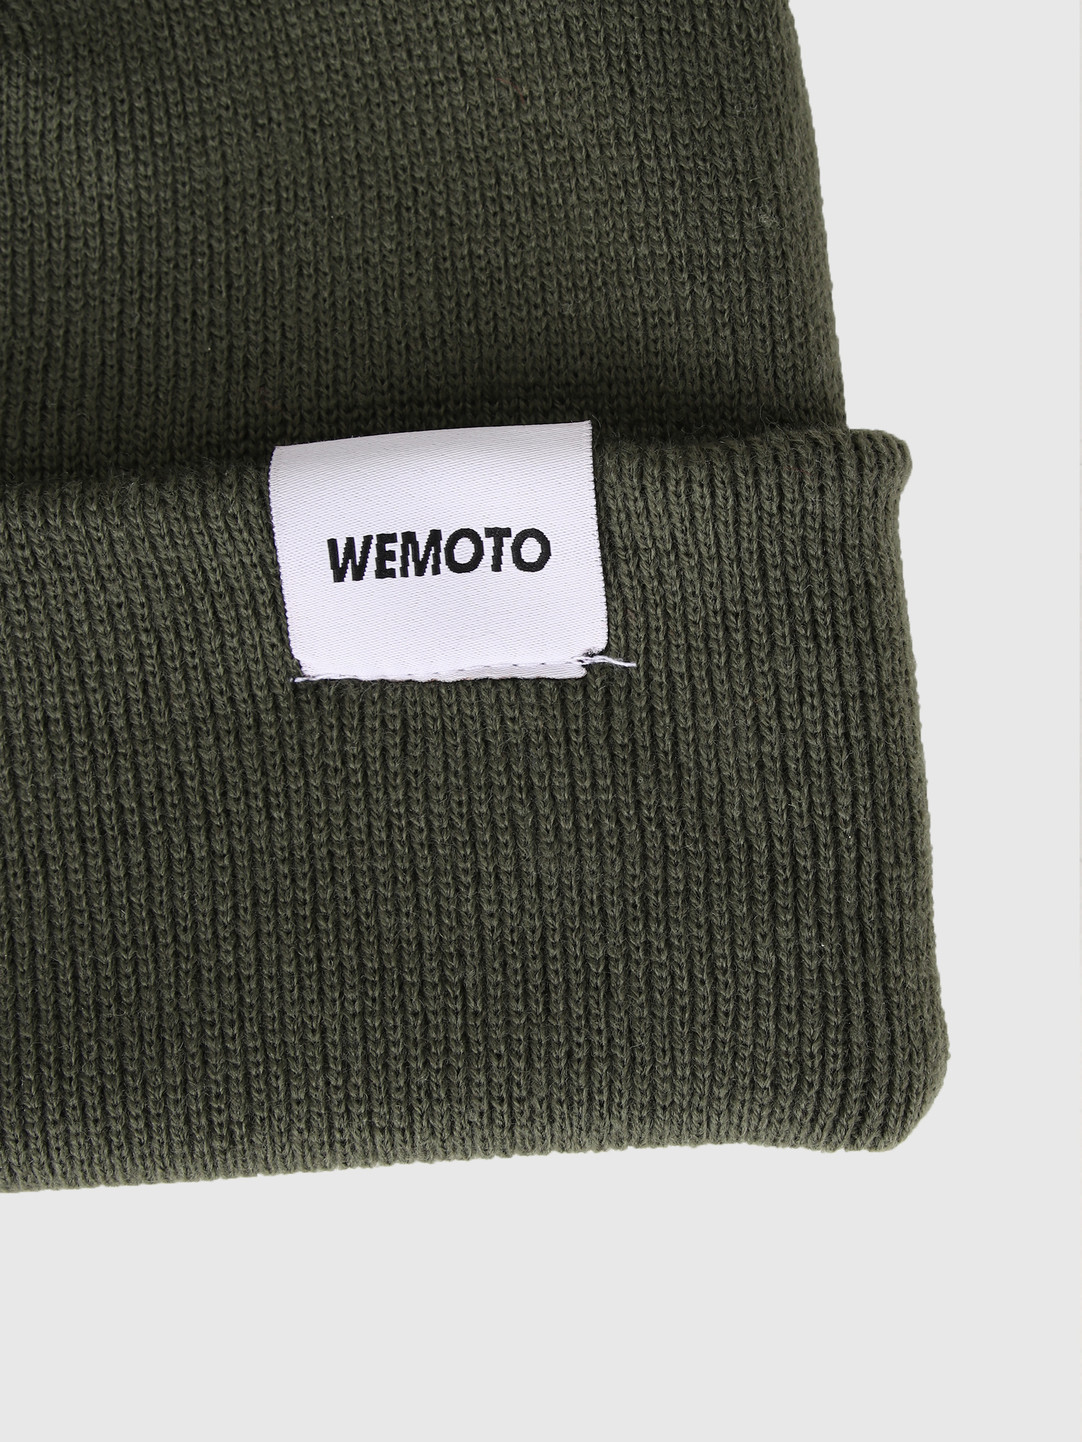 Wemoto Wemoto North Beanie Olive 143.809-608